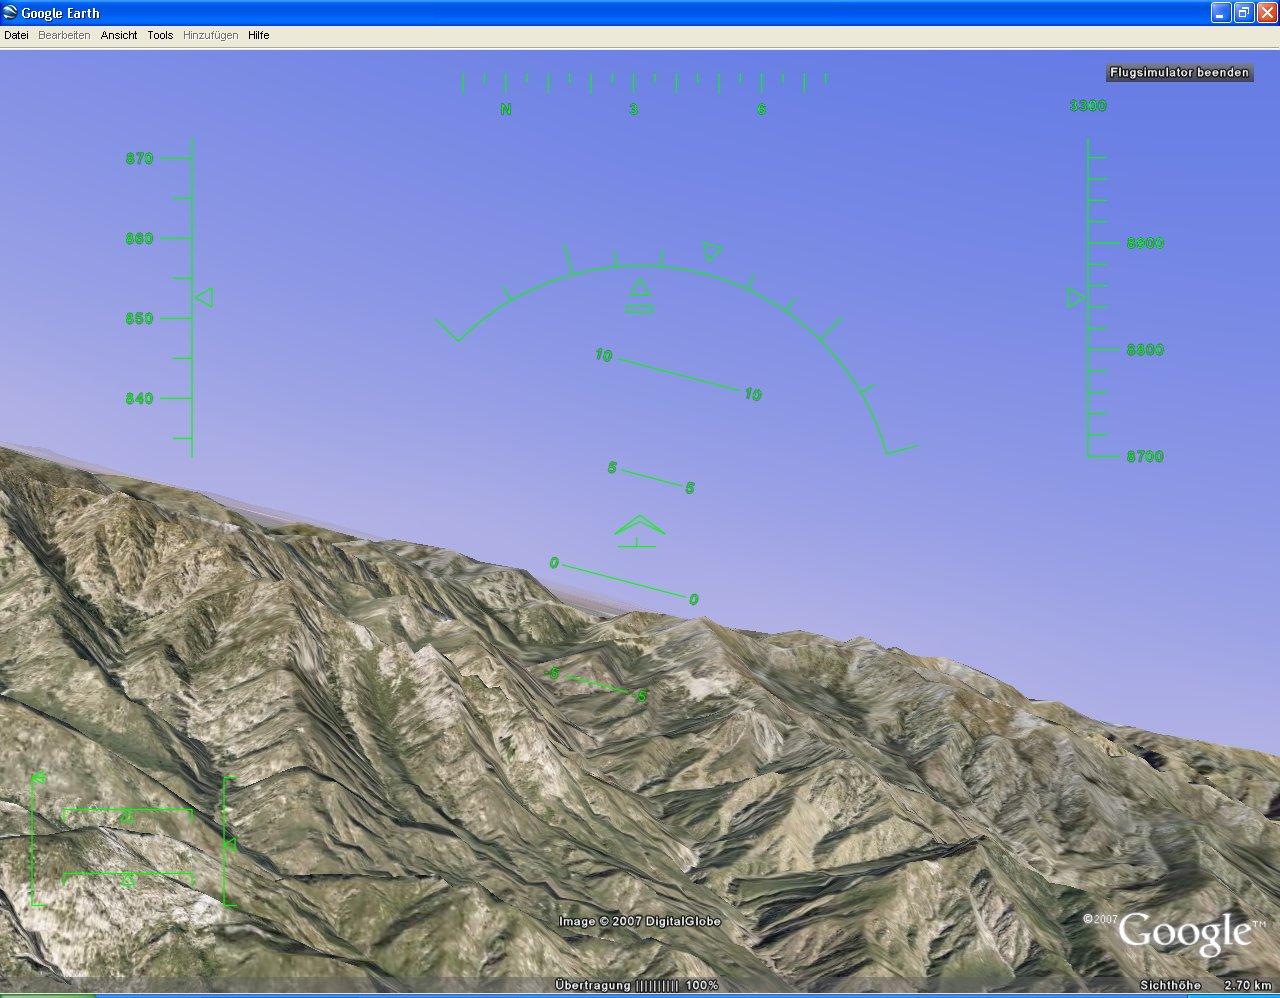 Versteckter Flugsimulator in Google Earth